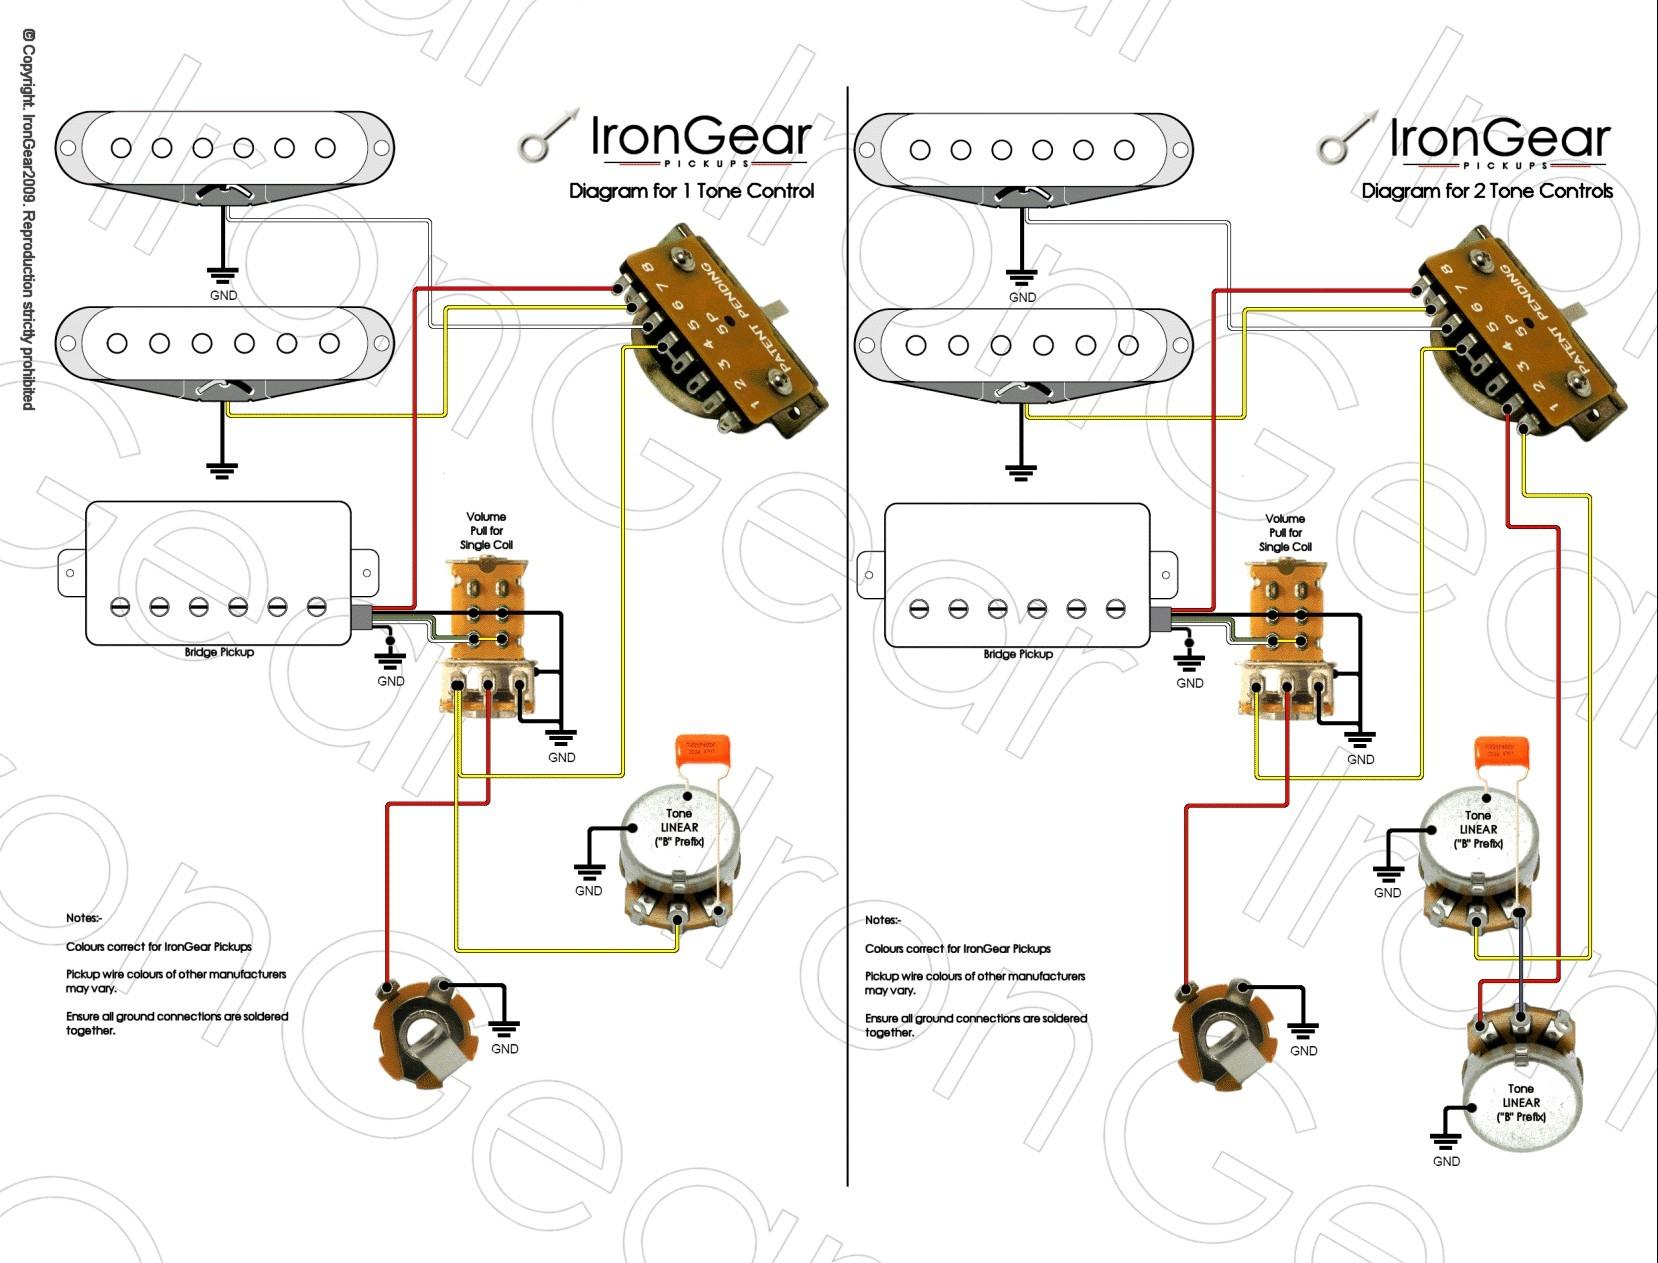 1 humbucker 1 volume 1 tone unique wiring diagram image three humbucker wiring diagram inspiration three humbucker wiring diagram fresh 1 x humbucker 2 x single cheapraybanclubmaster Images